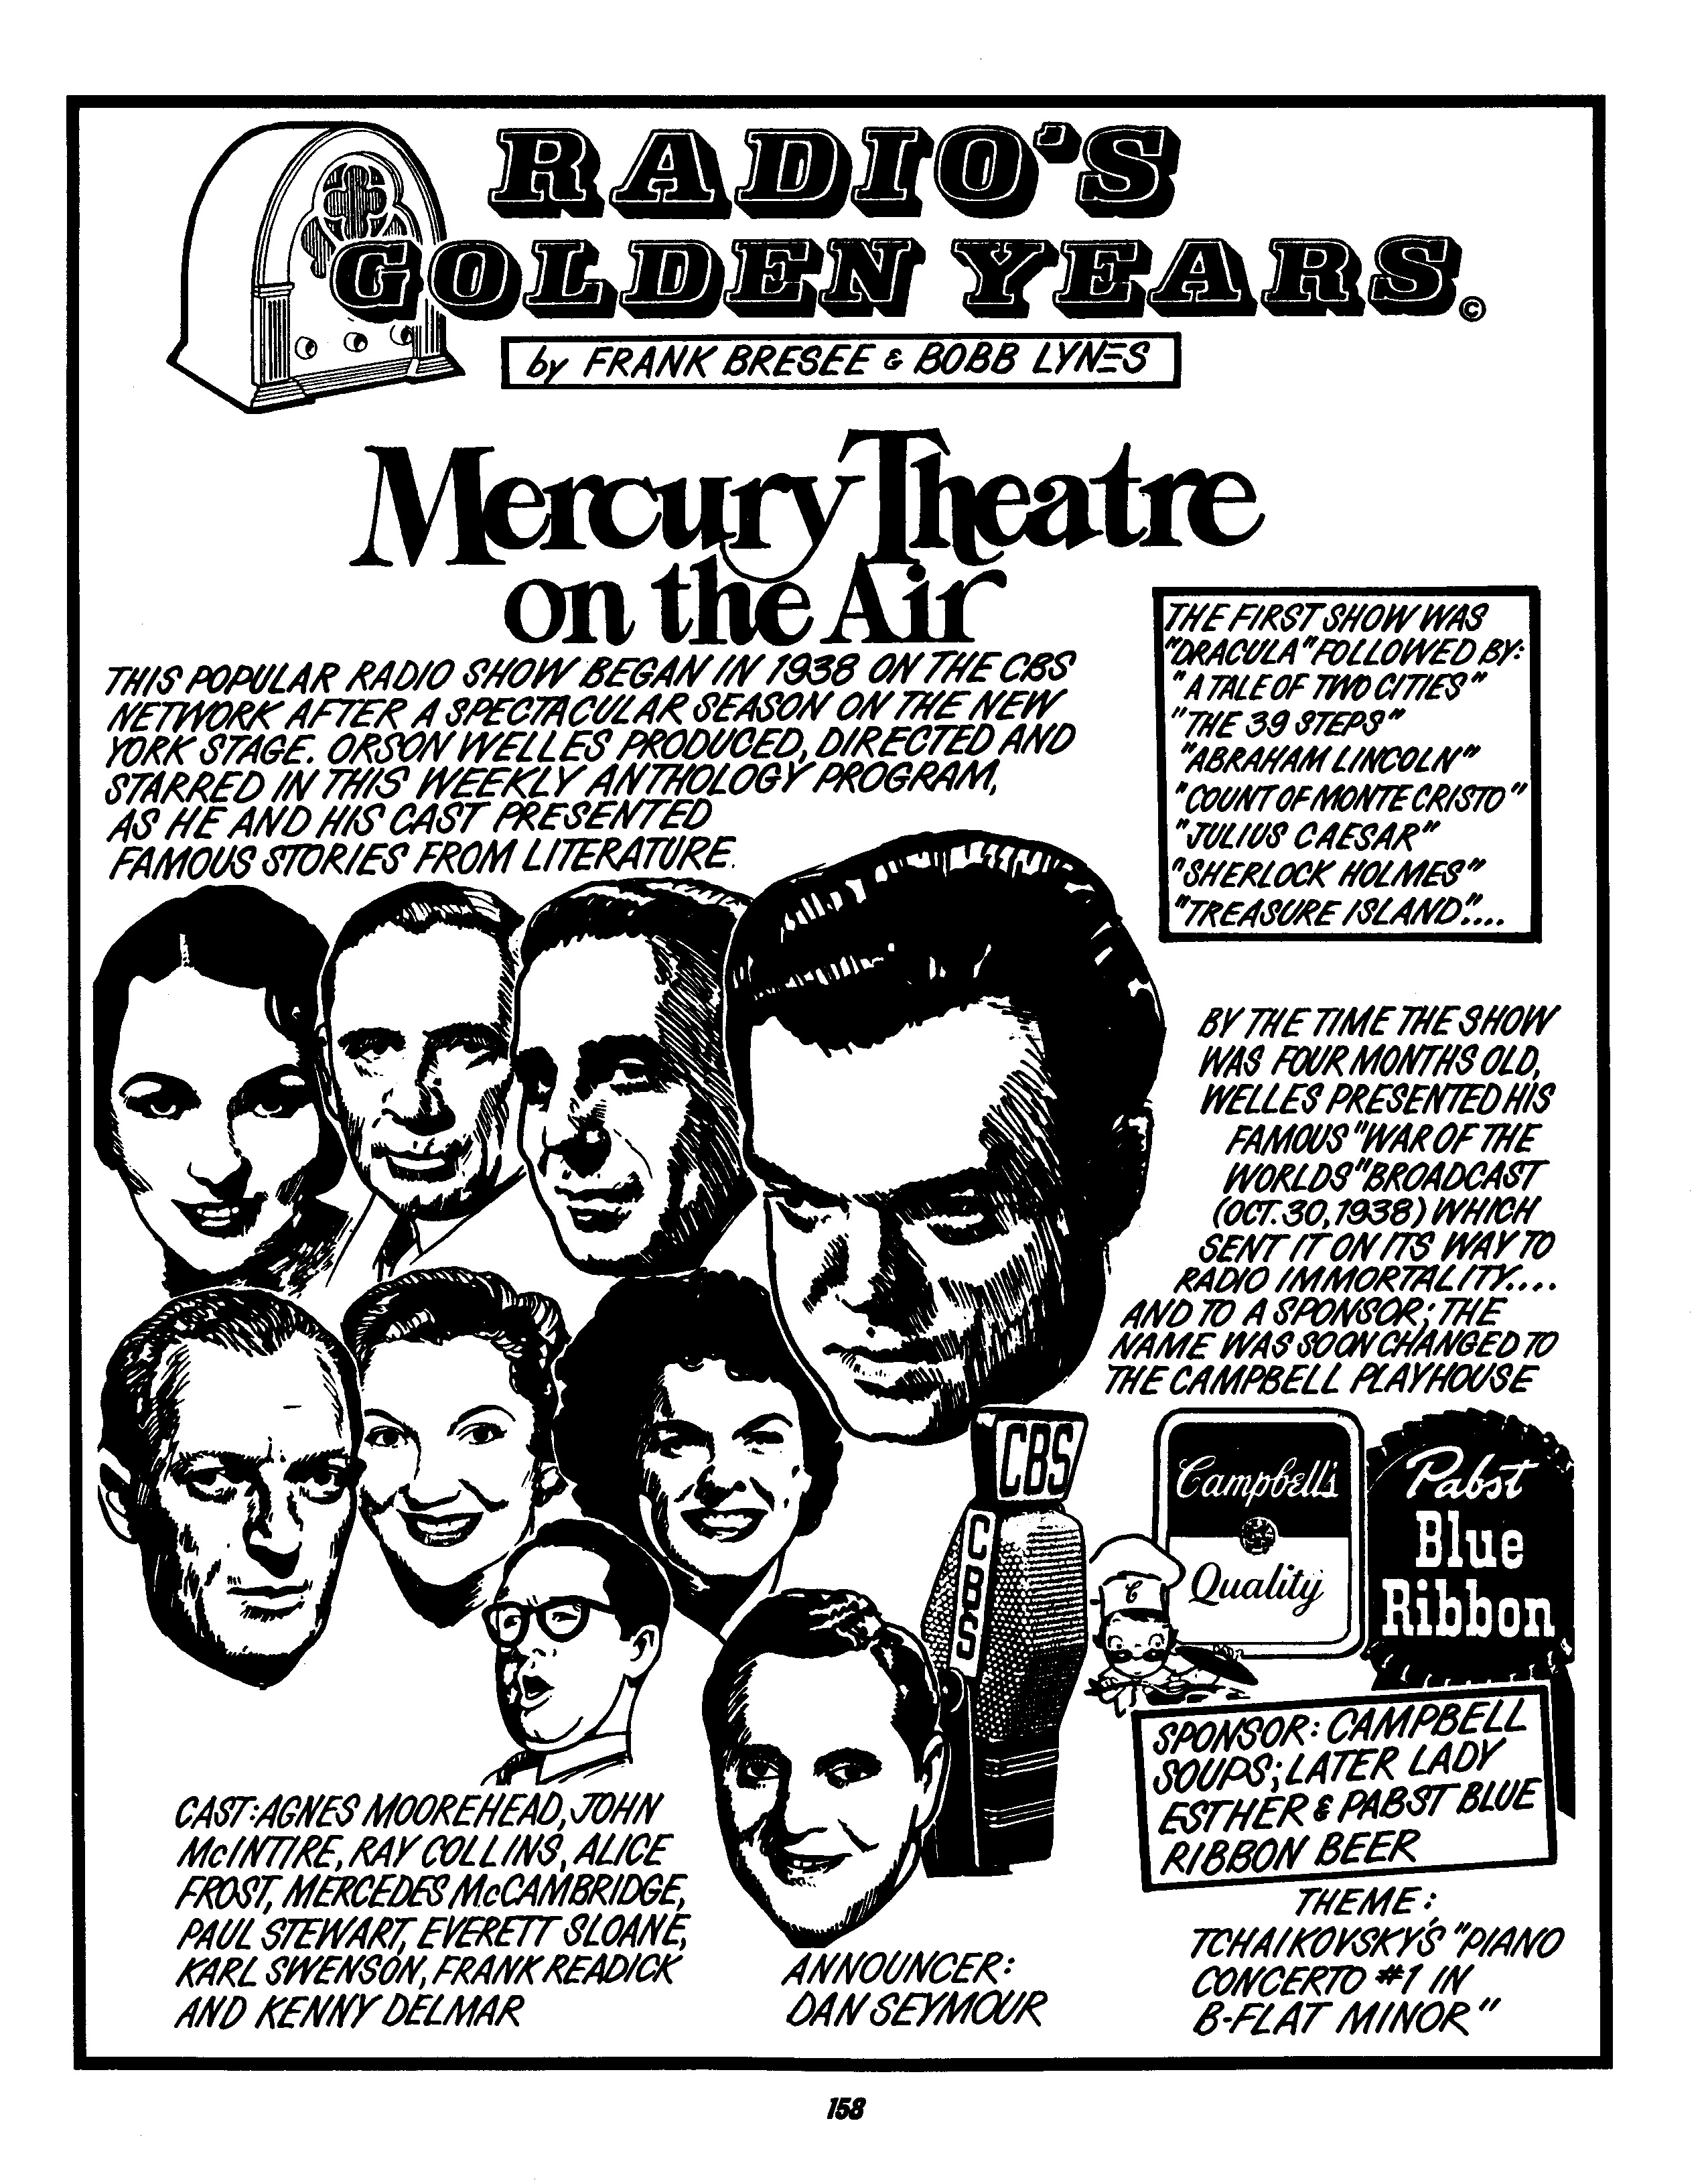 Mercury Theater